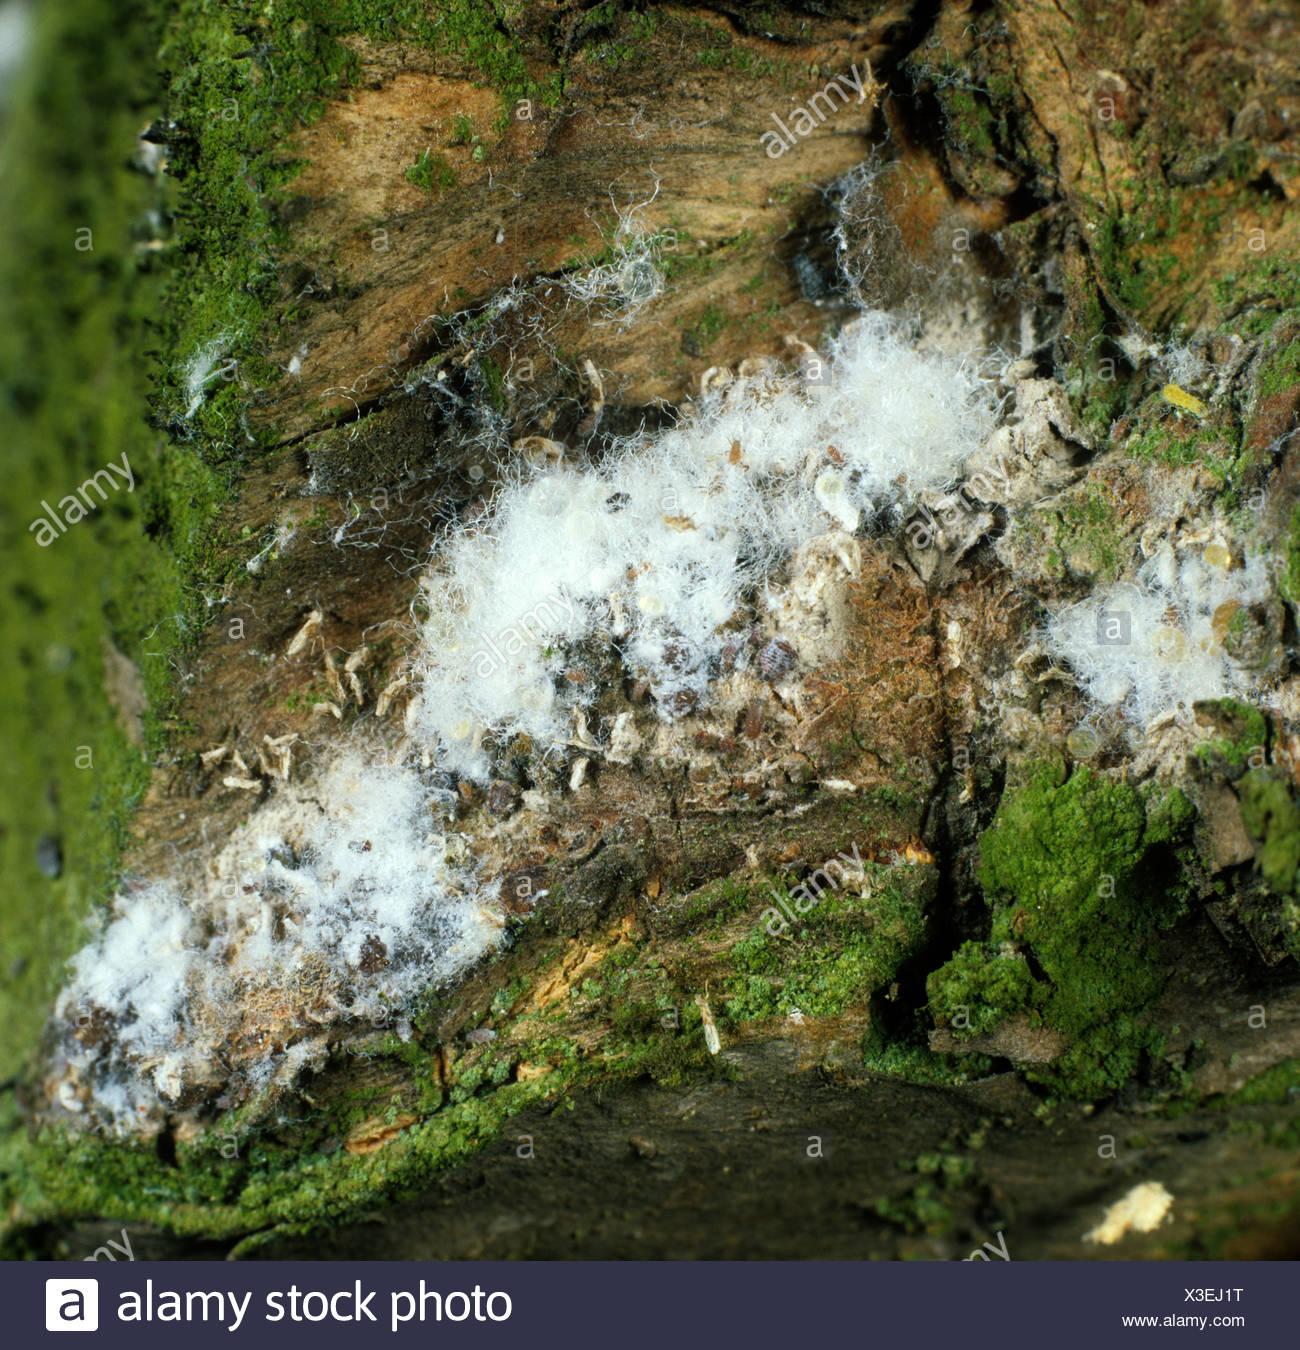 Woolly aphid Eriosoma lanigerum colony on apple wood - Stock Image